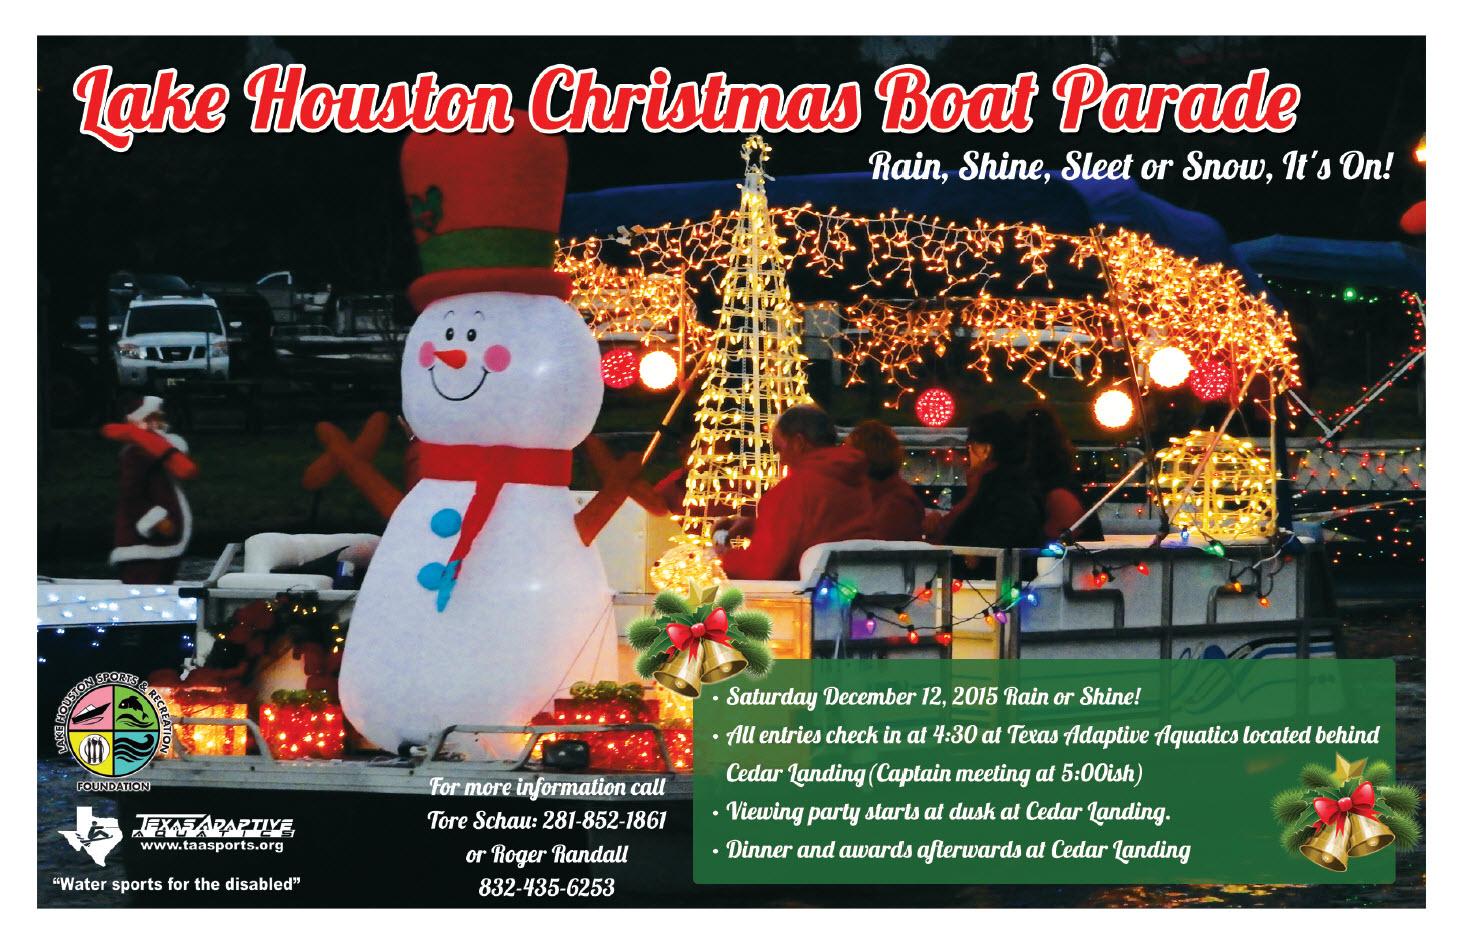 Lake Houston Christmas Boat Parade Saturday December 12 2015